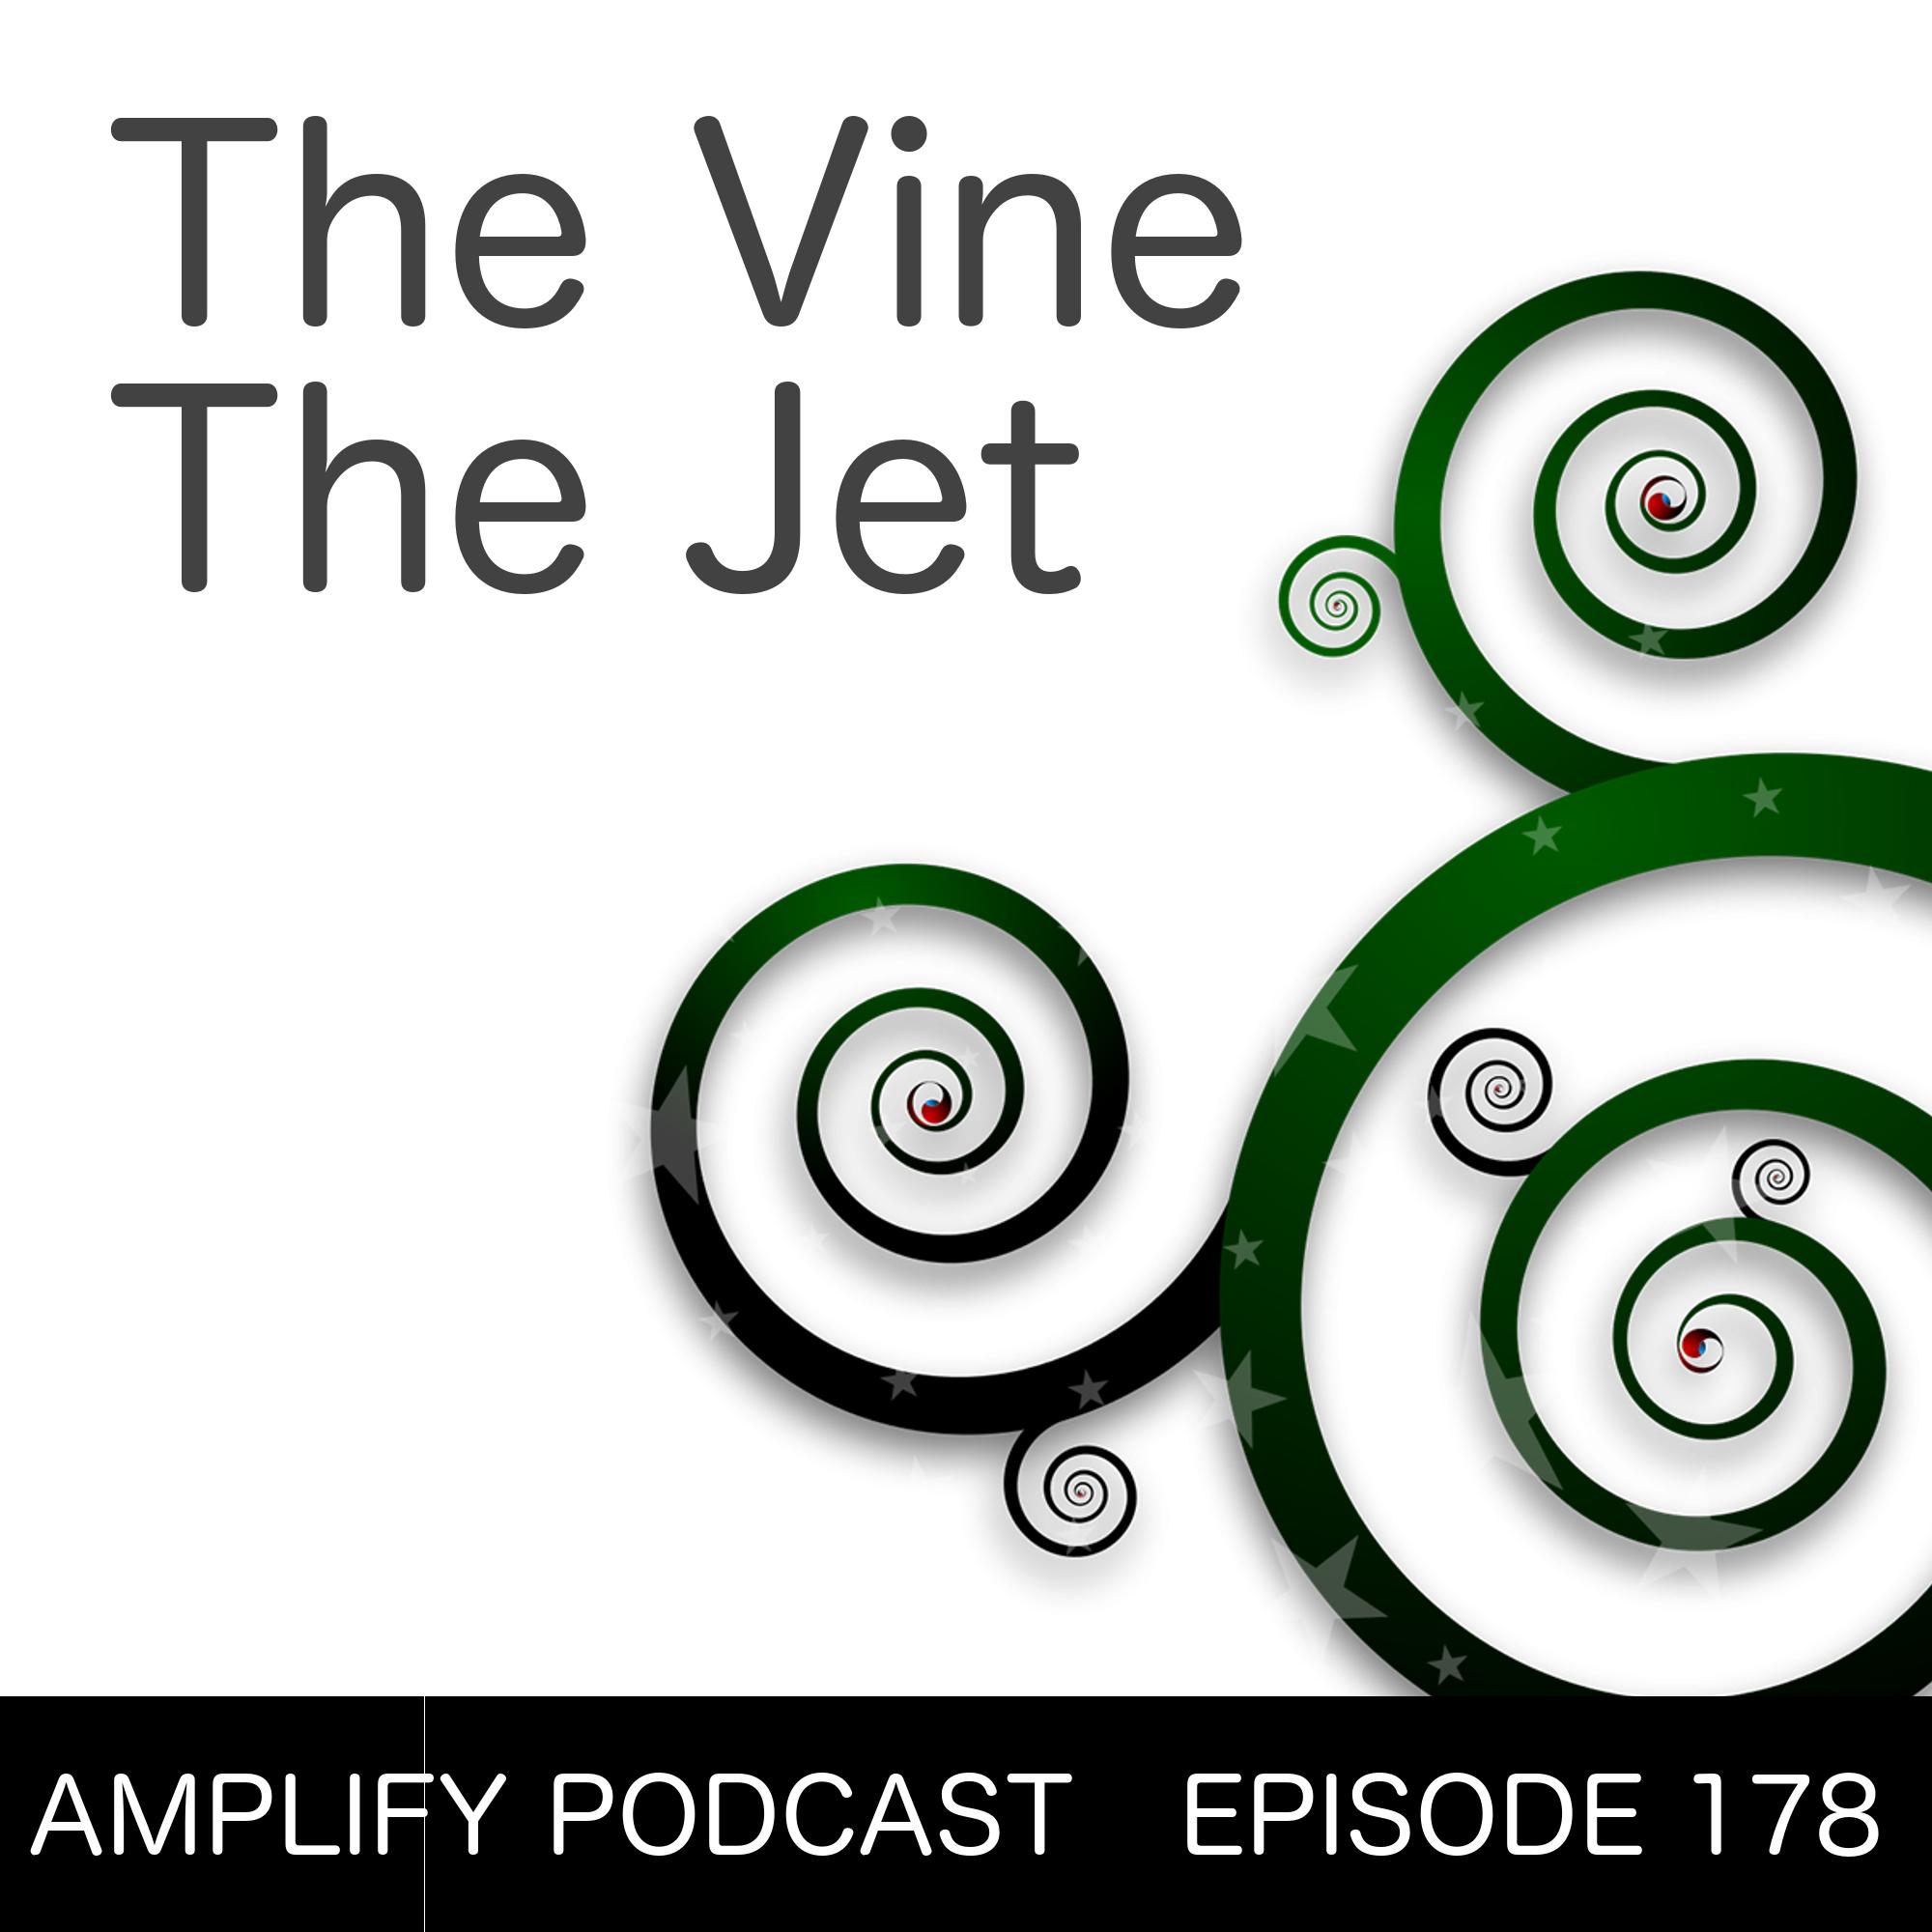 The Vine The Jet